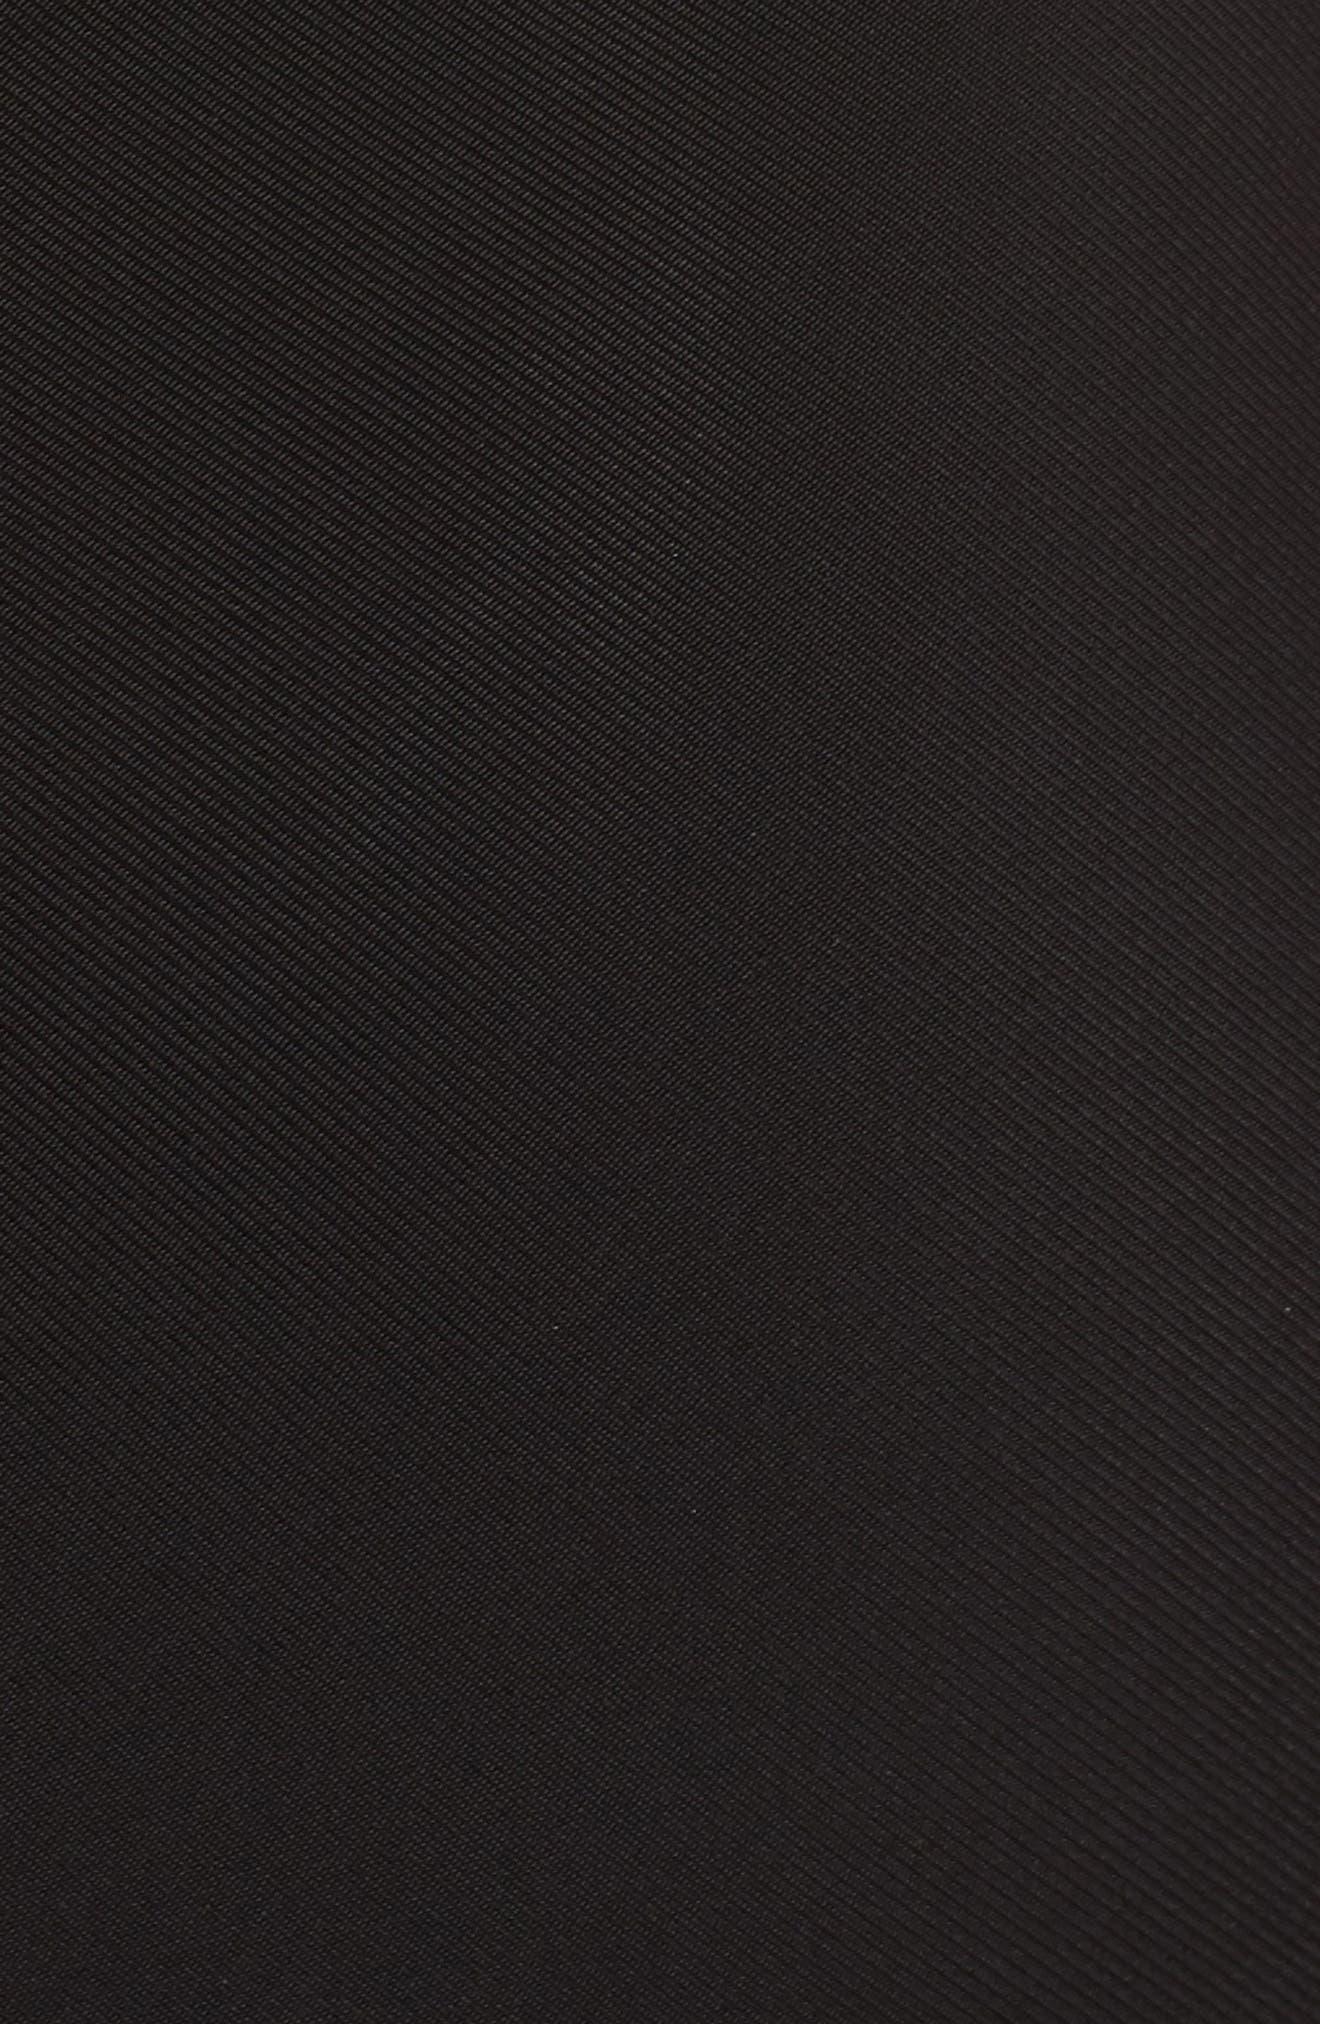 Tara High/Low Knit Dress,                             Alternate thumbnail 5, color,                             001